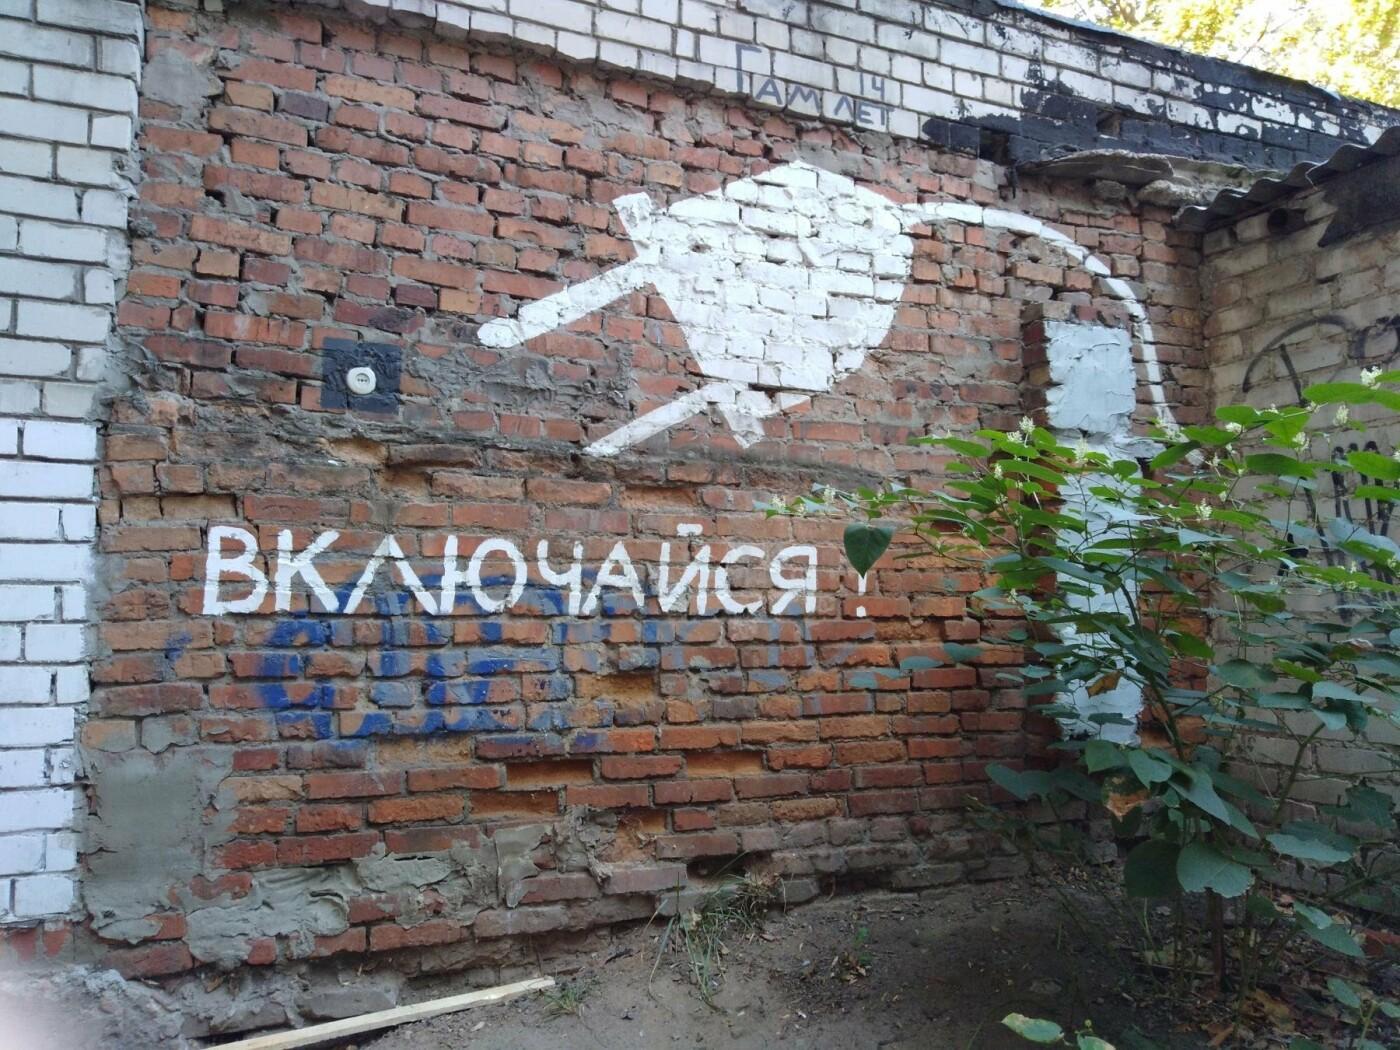 Стрит-арт Гамлета в Харькове: ТОП-10 граффити художника, - ФОТО, фото-25